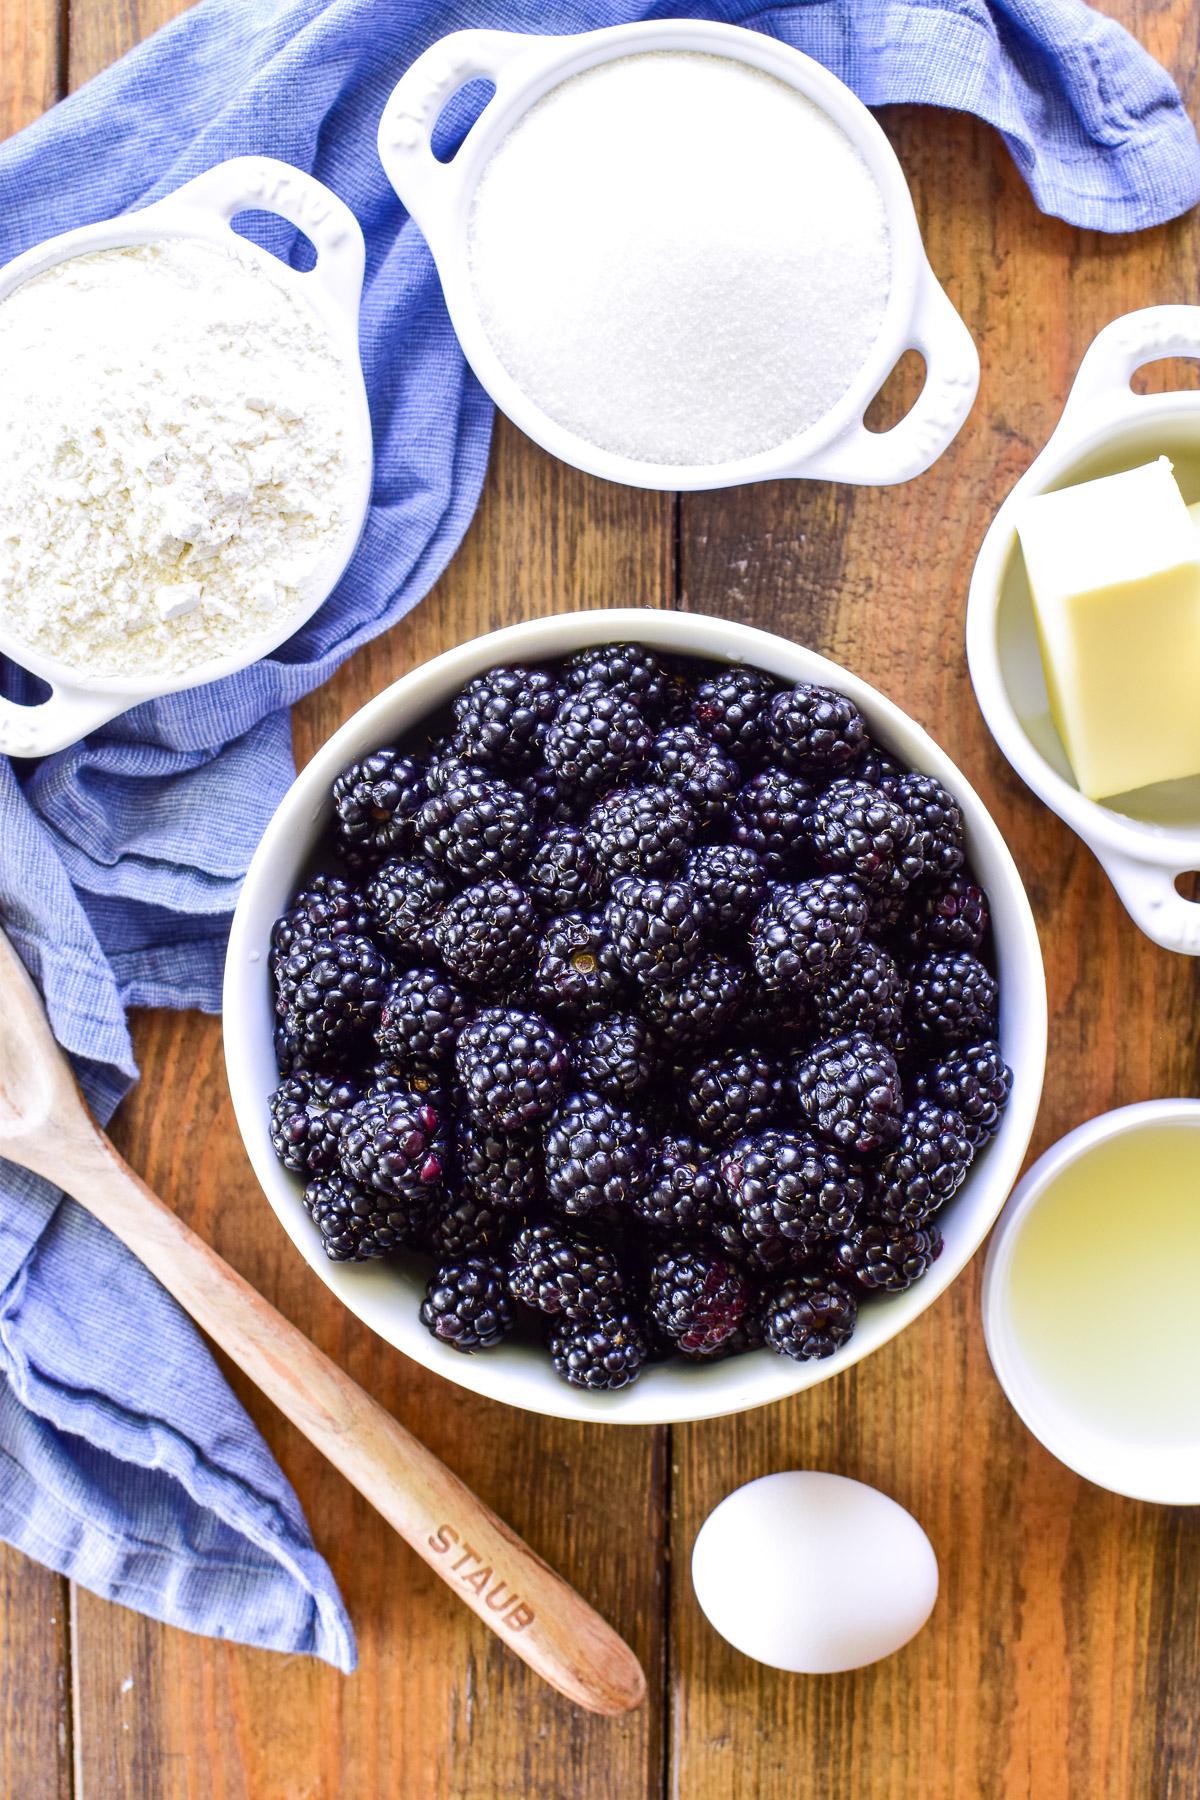 Blackberry Cobbler ingredients in bowls